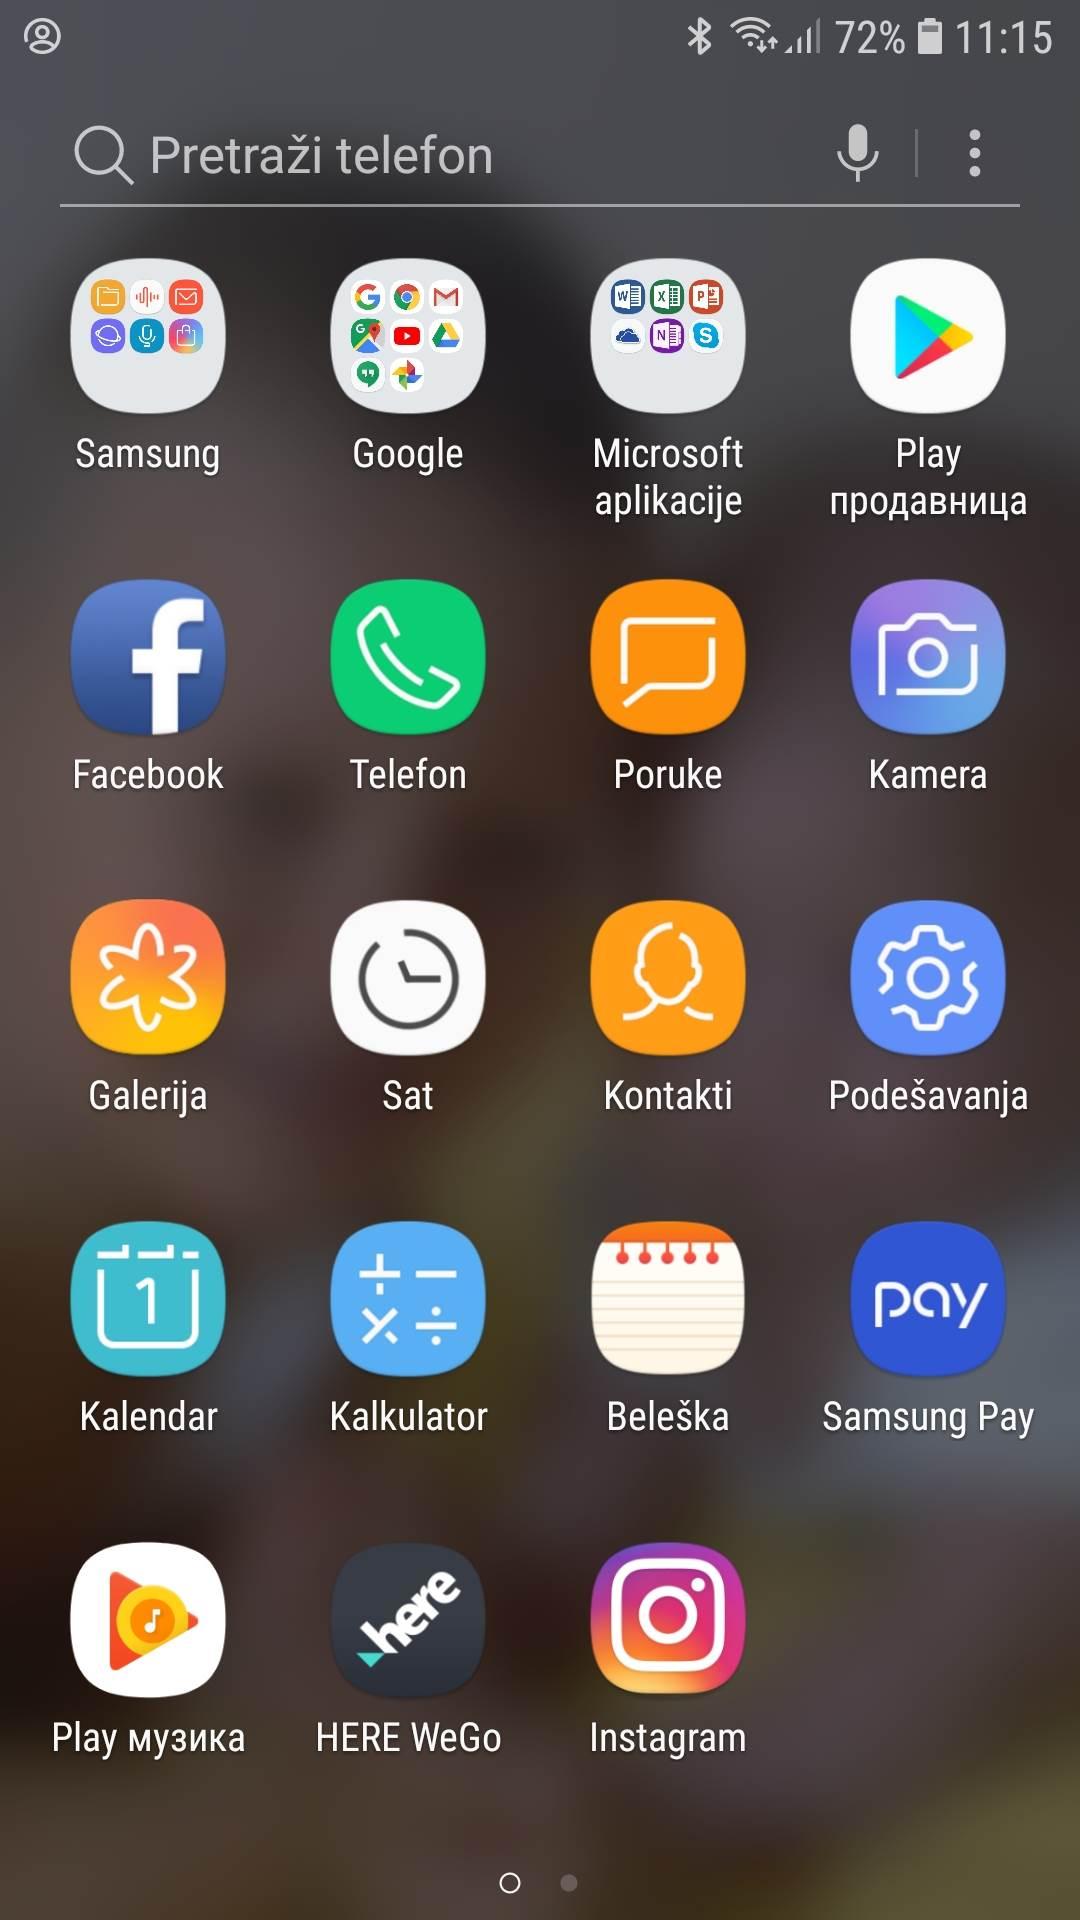 Konačno Oreo za Samsung Galaxy S7 i S7 edge (FOTO)